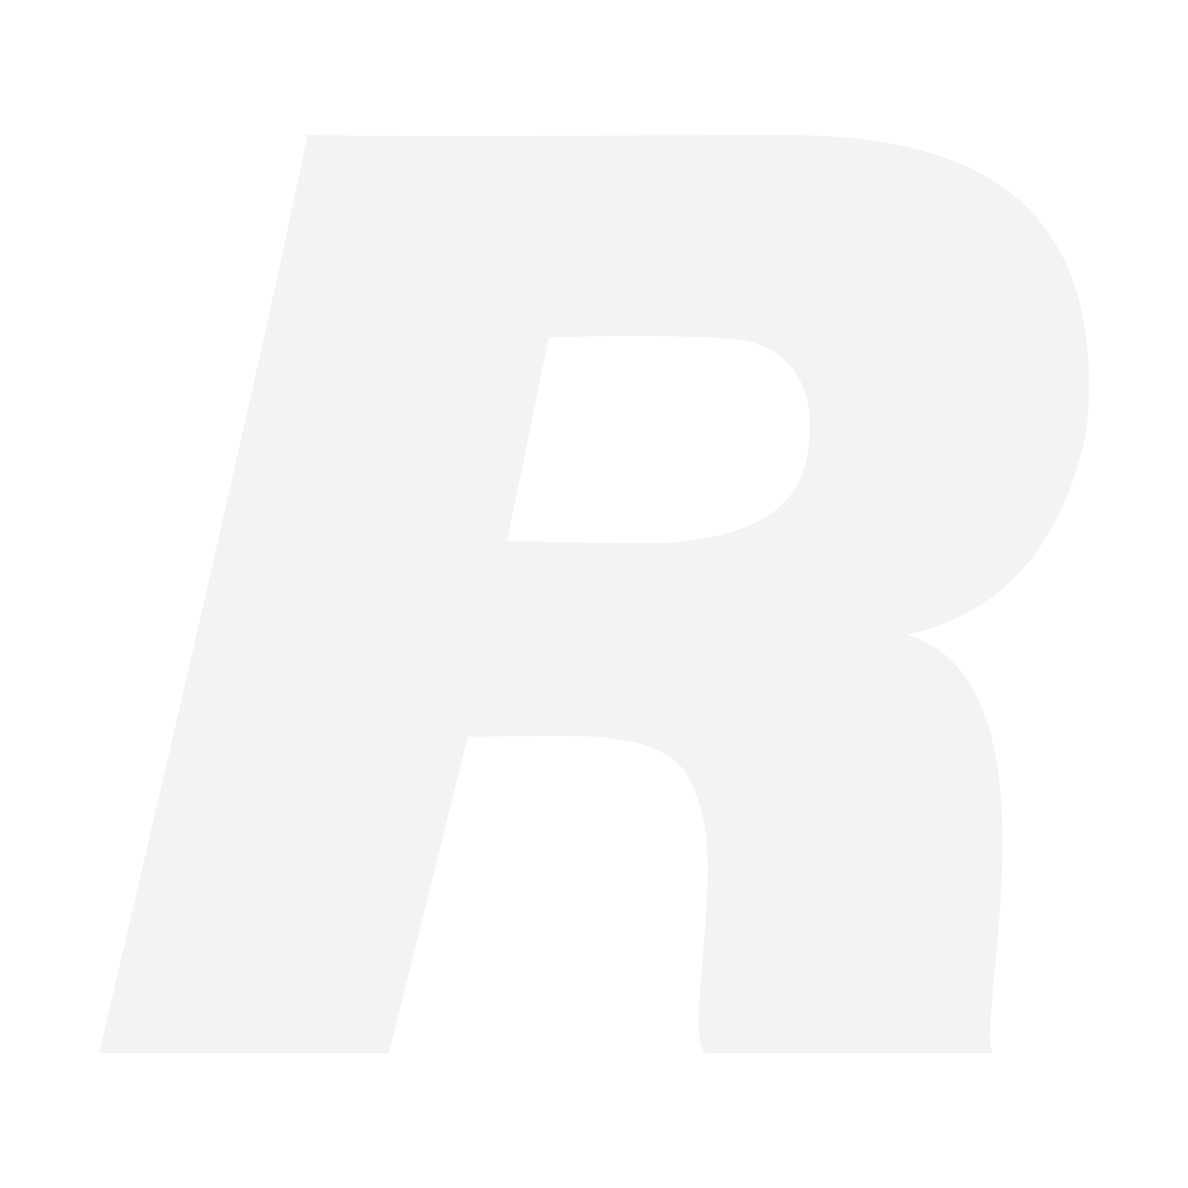 SONY HDR-AS50B ACTION VIDEOKAMERA